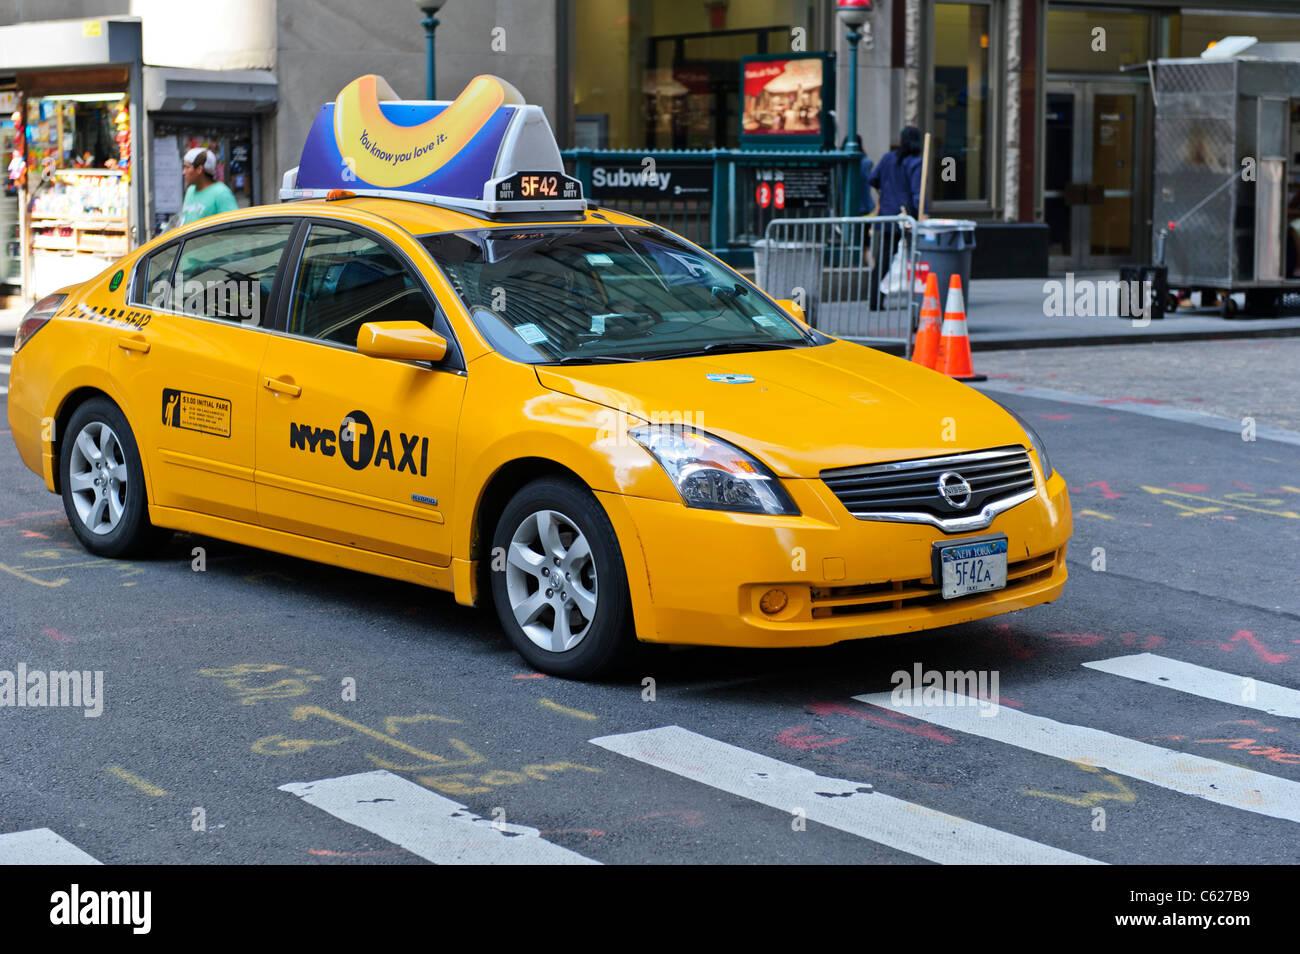 Yellow Taxi, New York City, Manhattan, United States. - Stock Image